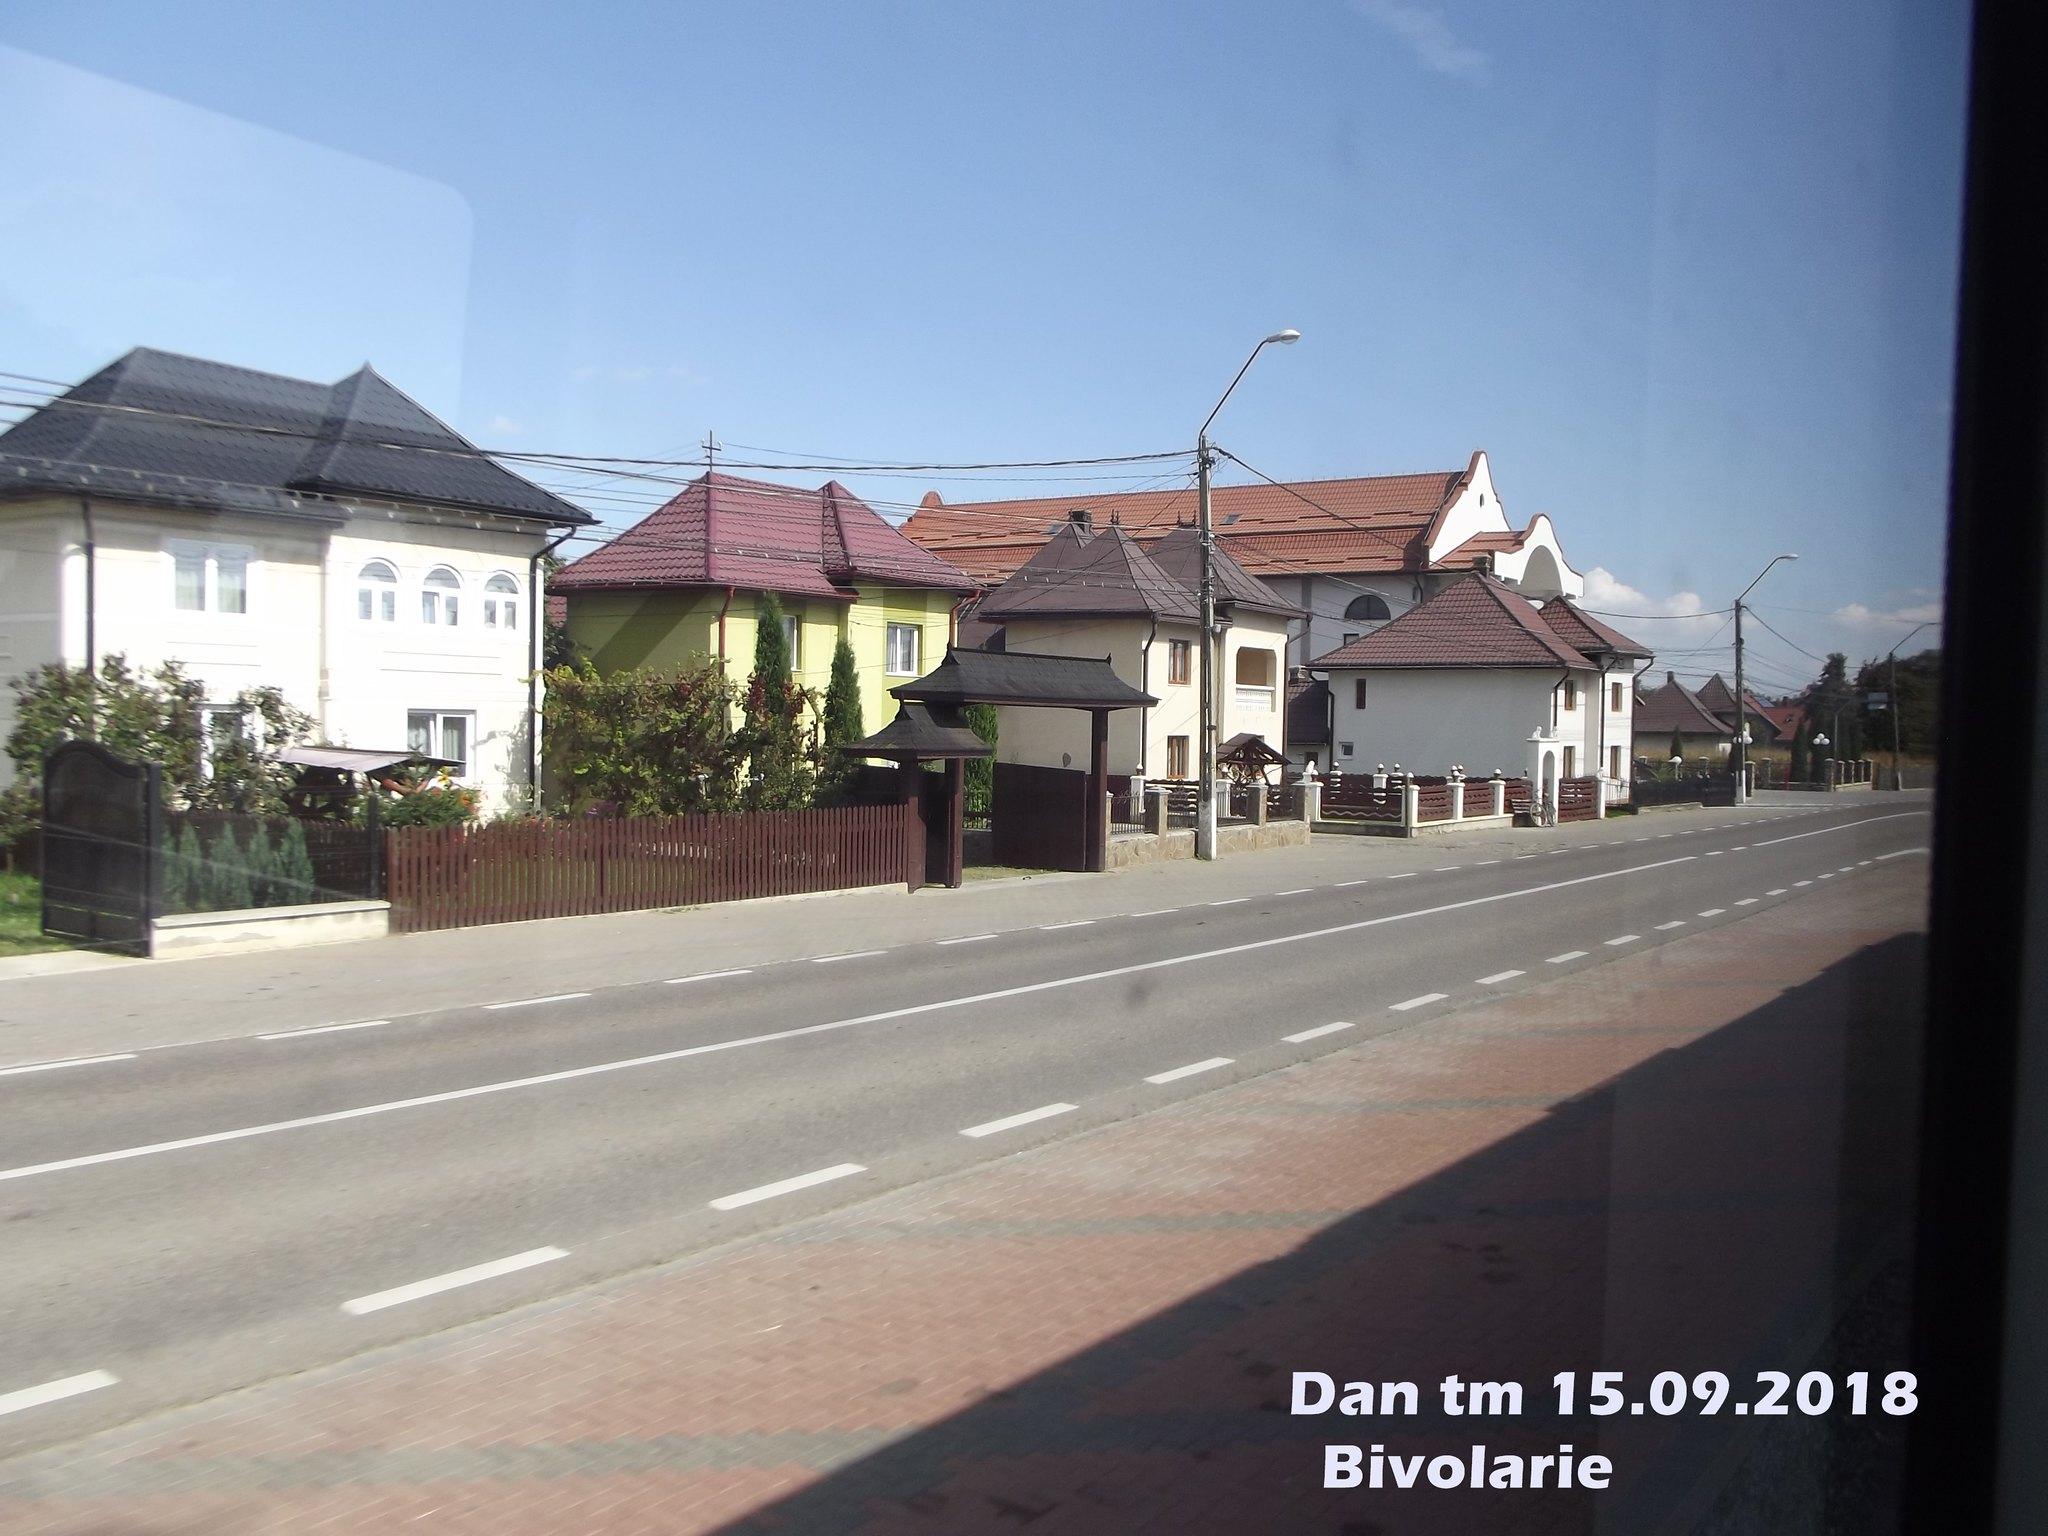 515 : Dorneşti - Gura Putnei - (Putna) - Nisipitu - Seletin UKR - Pagina 47 44685370142_b0bdad8a4c_k